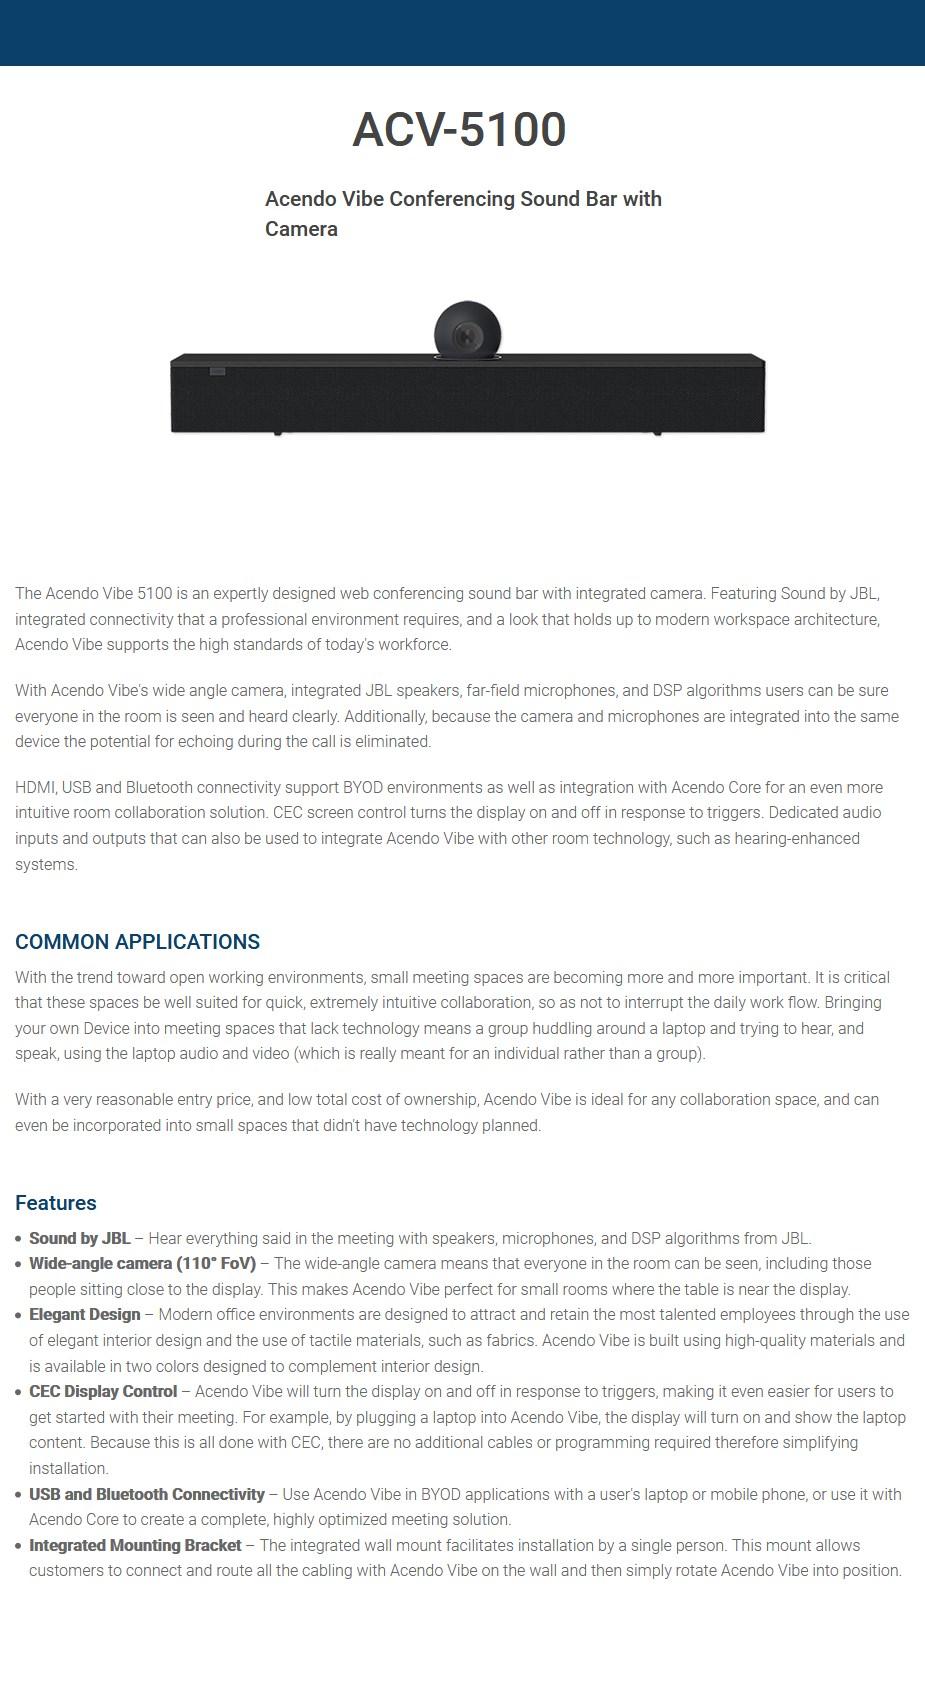 AMX by Harman ACV-5100BL Acendo Video Conferencing Camera With JBL Soundbar - Overview 1